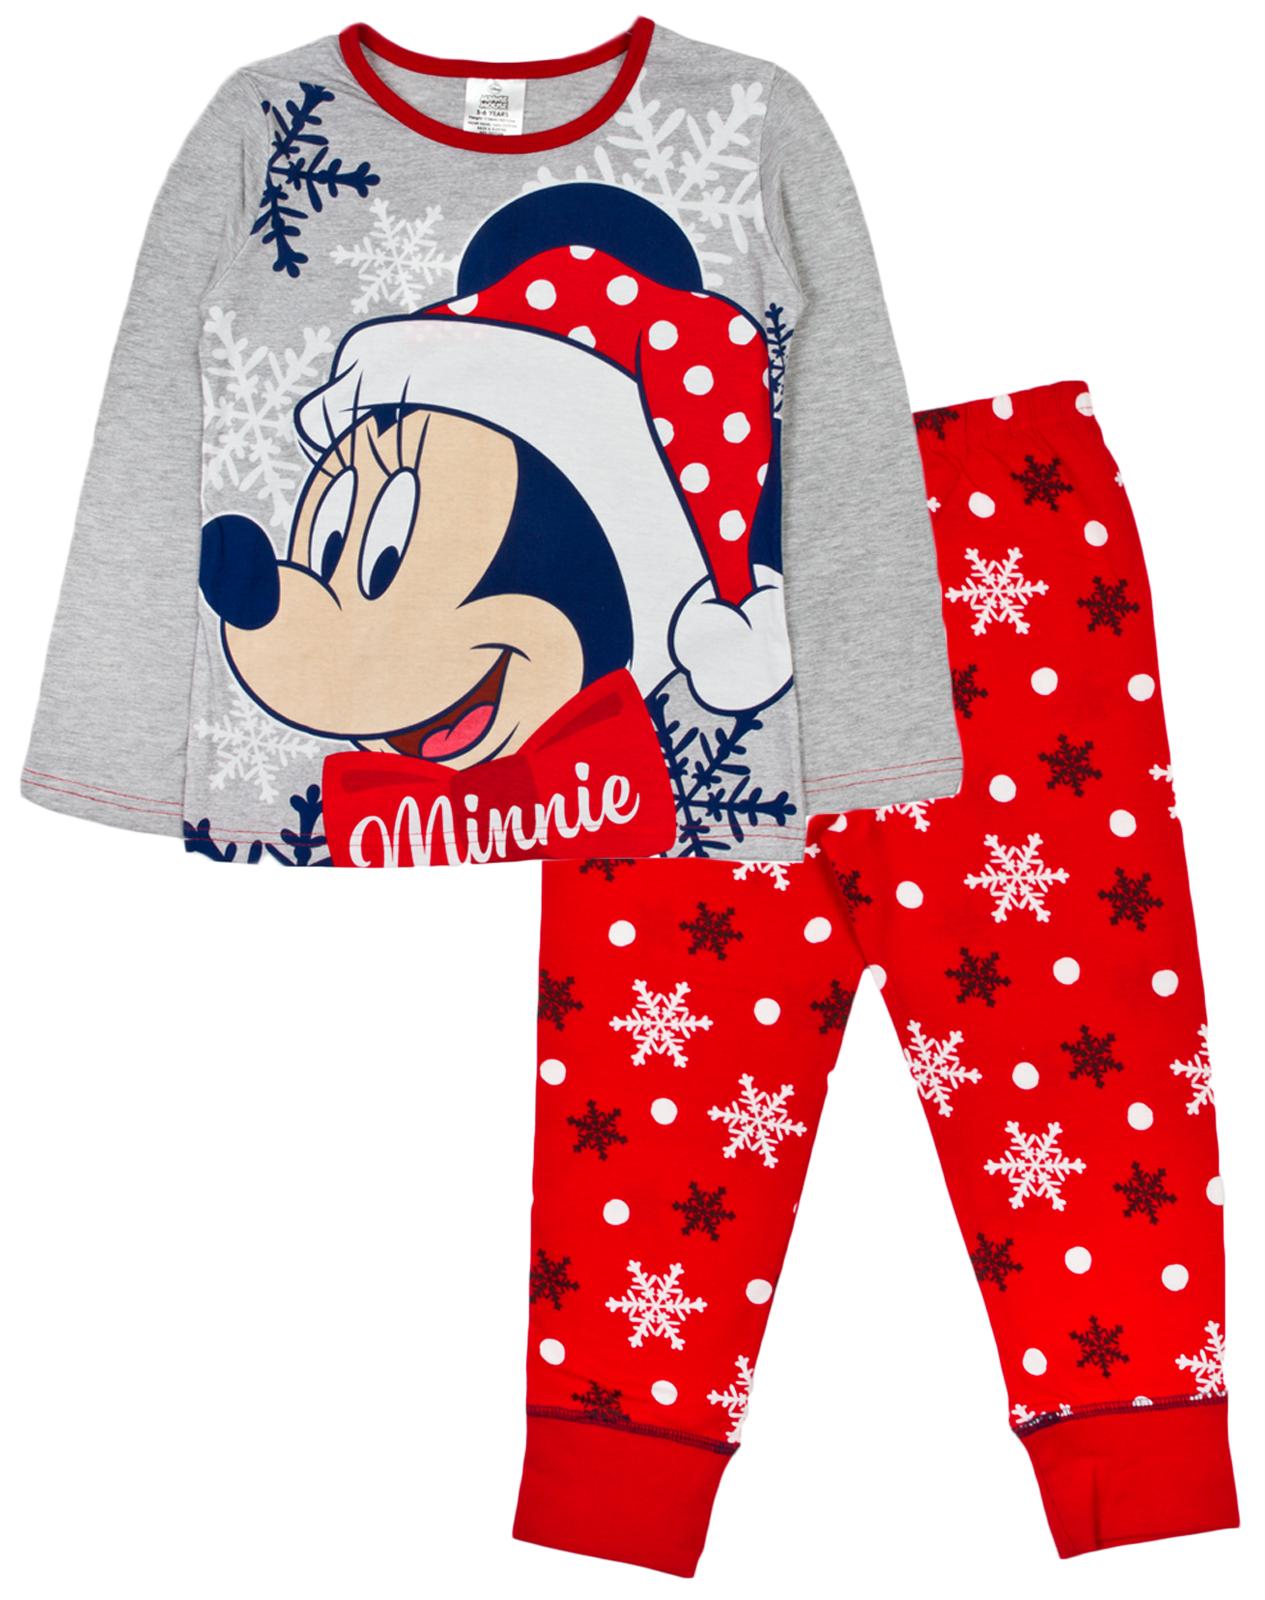 Girls Boys Christmas Character Pyjamas 2 Piece Pjs Warm Lounge Set Kids Size 3563037b8